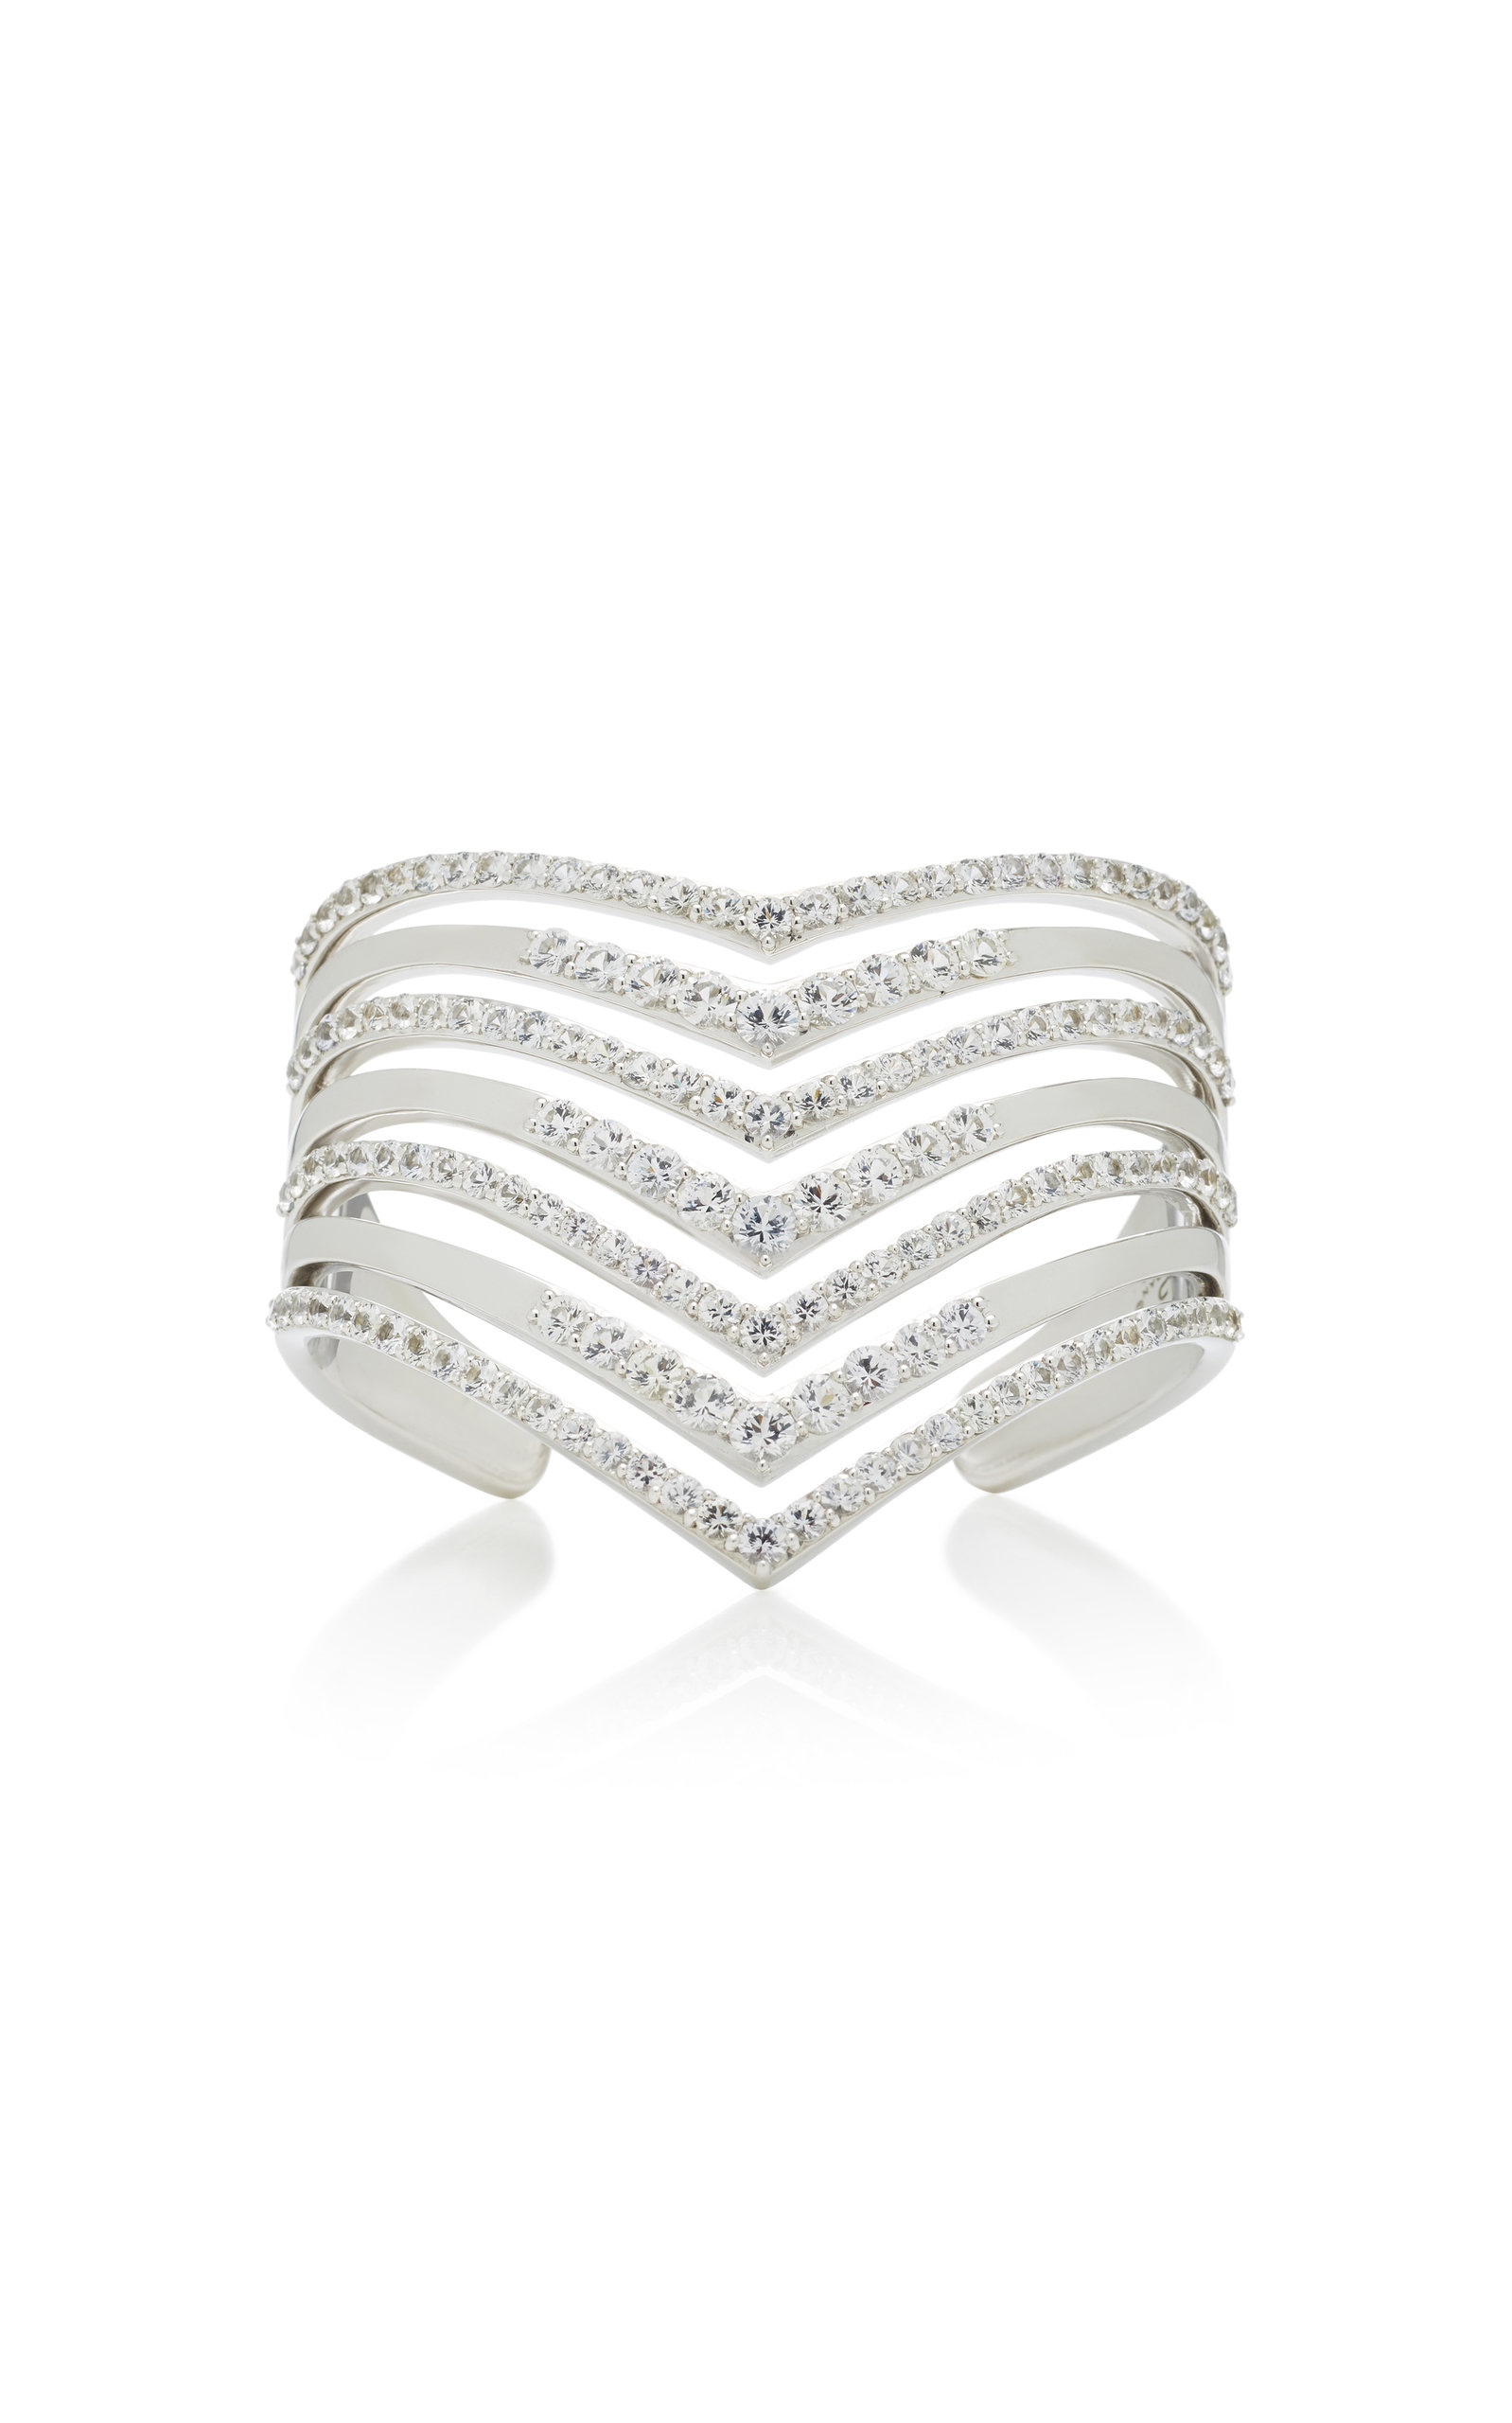 LYNN BAN JEWELRY Sterling Silver White Sapphire Cuff